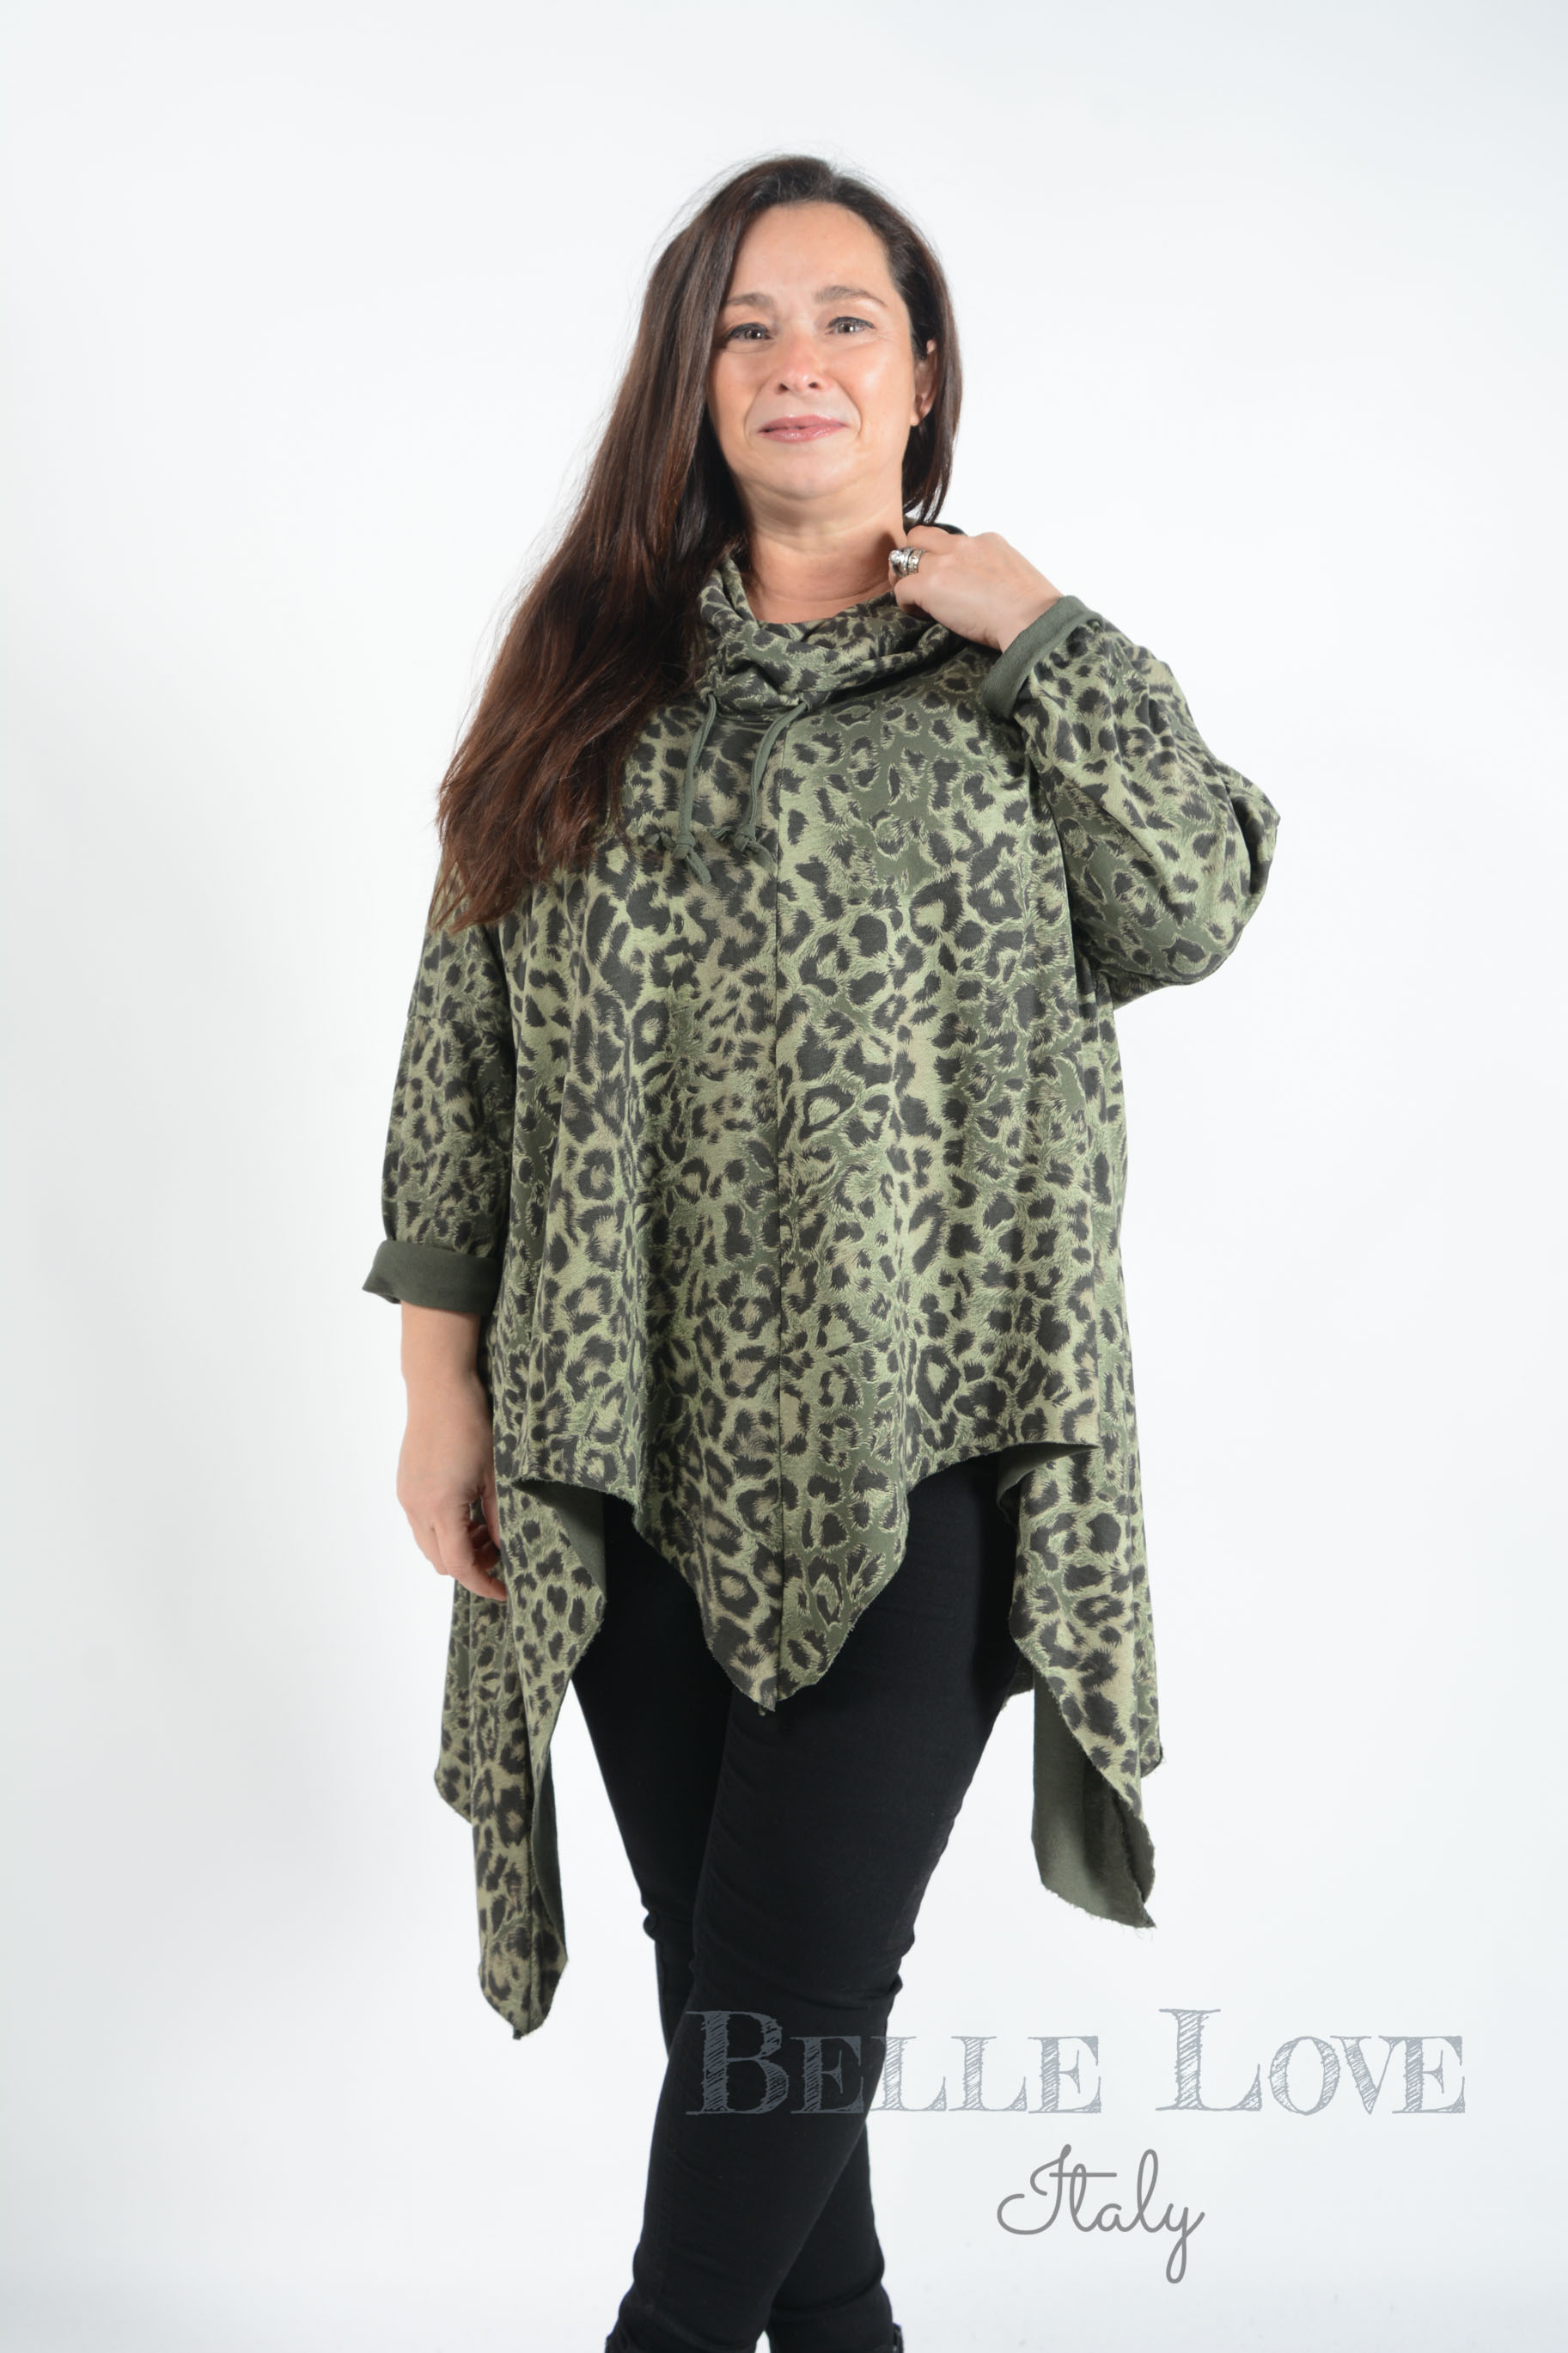 Belle Love Italy Hallie Cowl Neck Animal Print Tunic